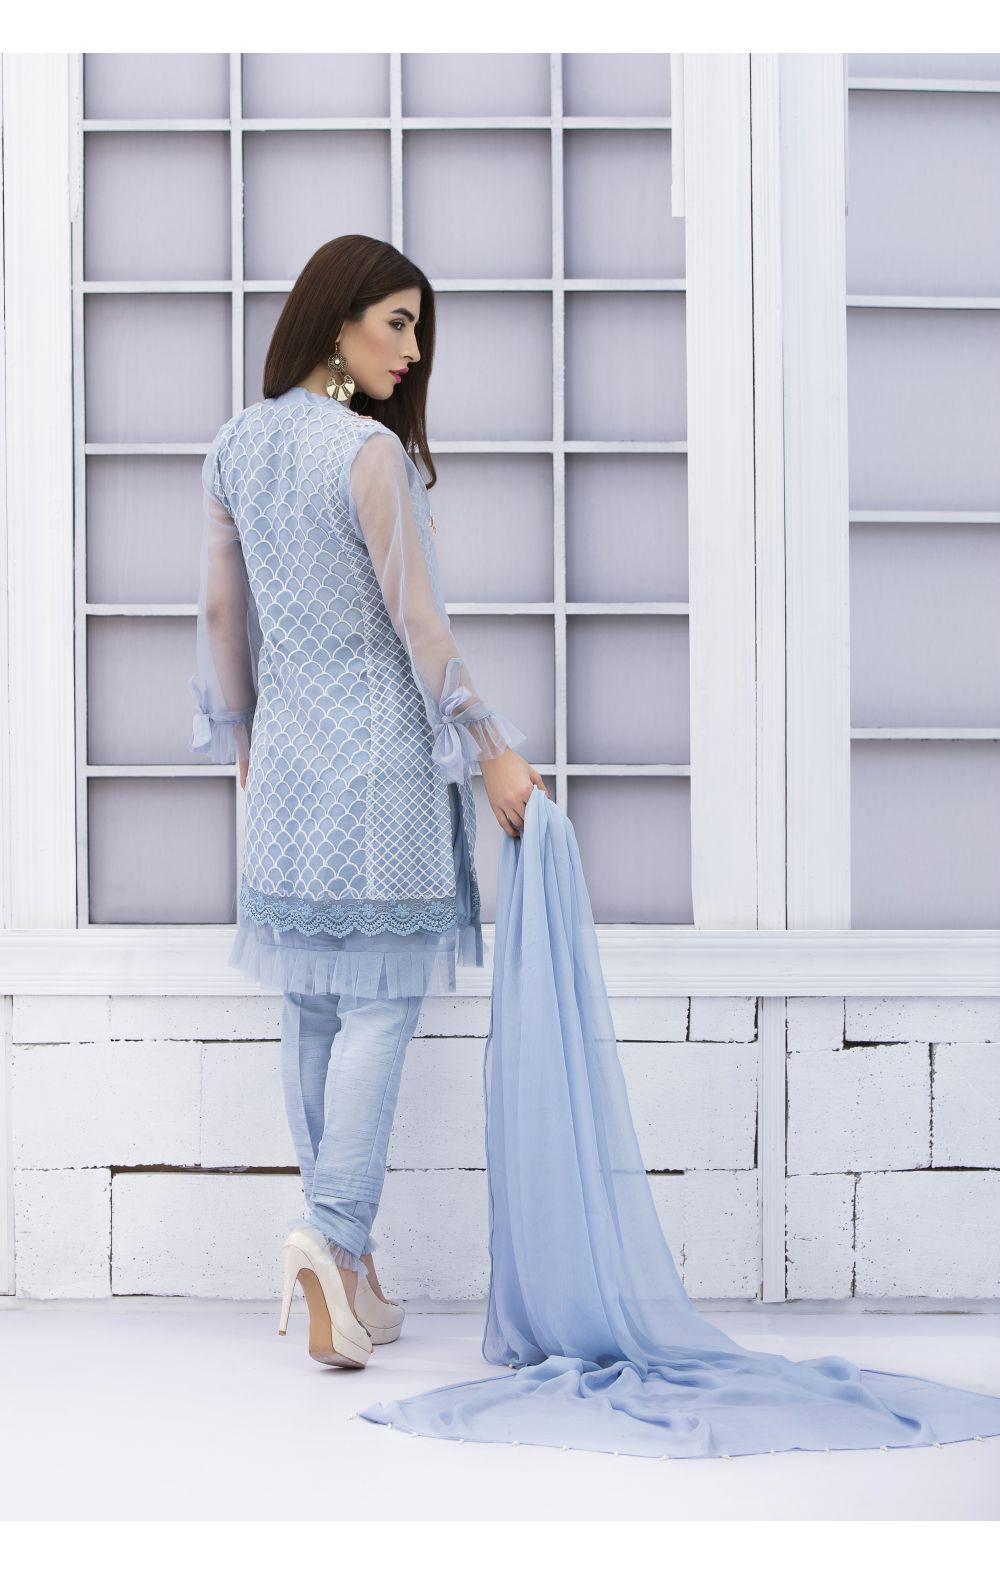 fddbbc8e36d Ice Blue Pakistani Wedding Dresses - Data Dynamic AG